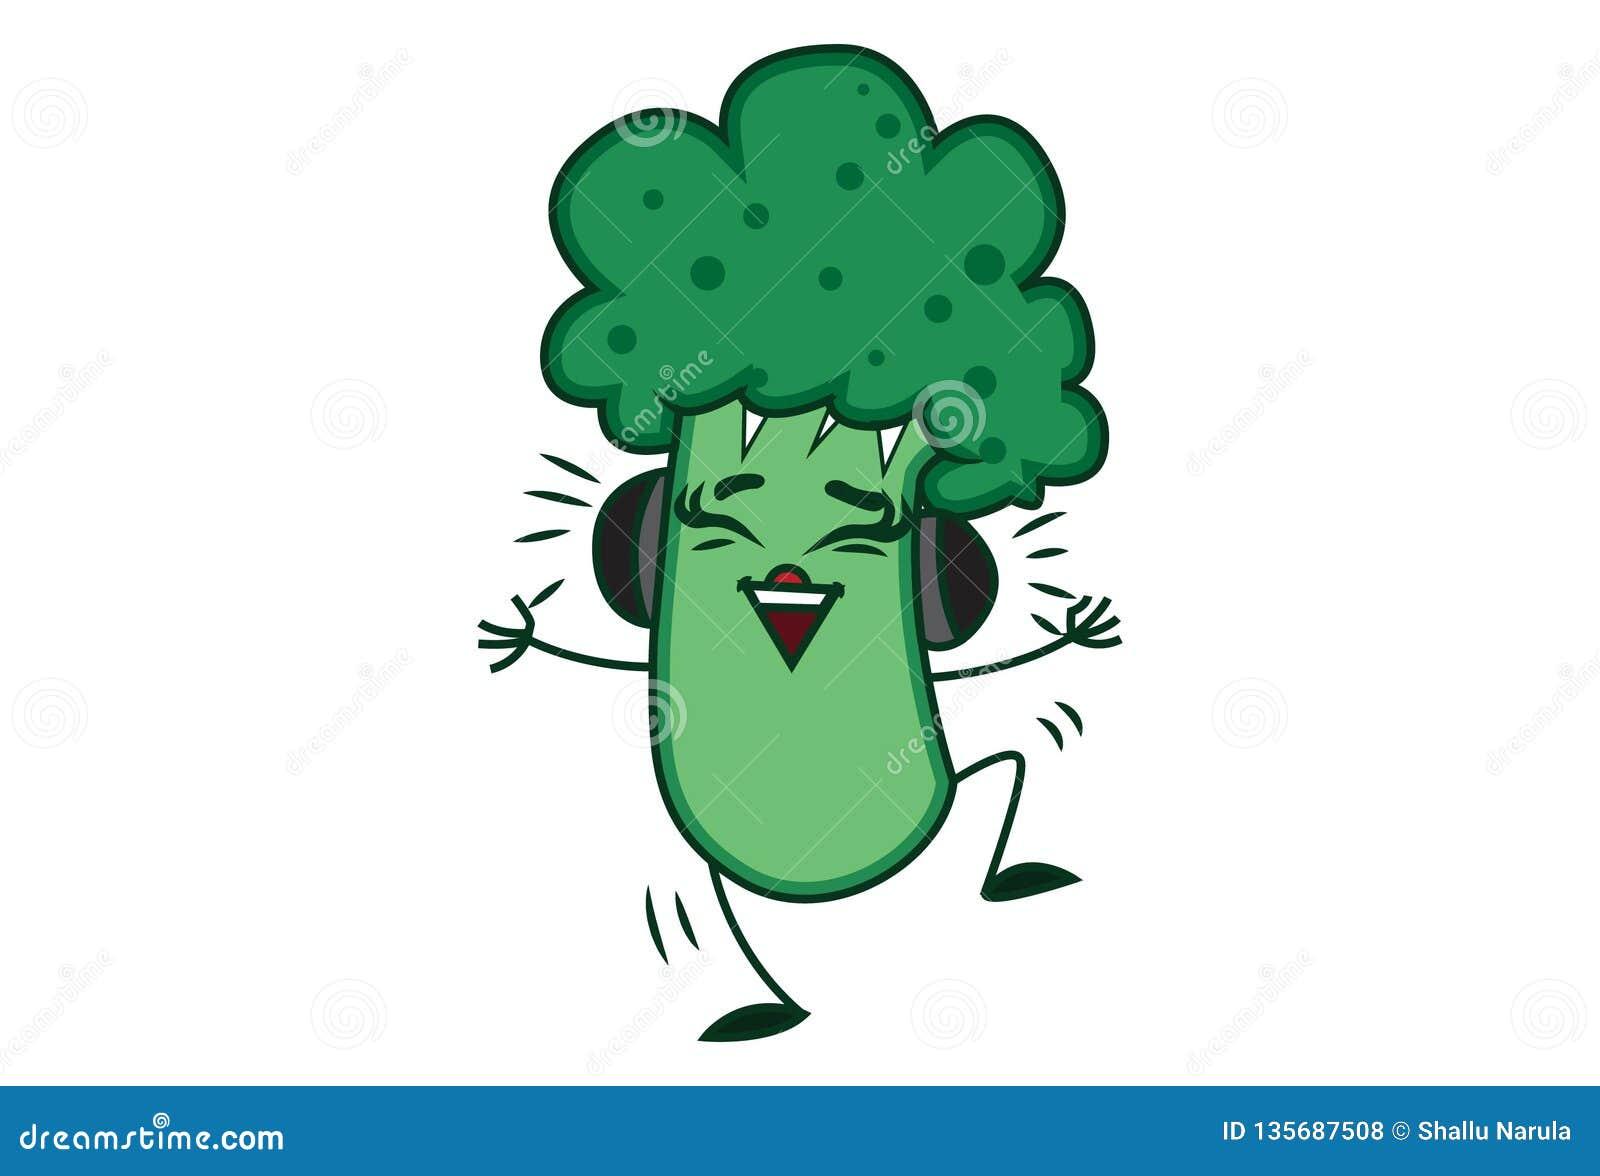 illustration of cute cartoon broccoli stock vector illustration of healthy diet 135687508 dreamstime com